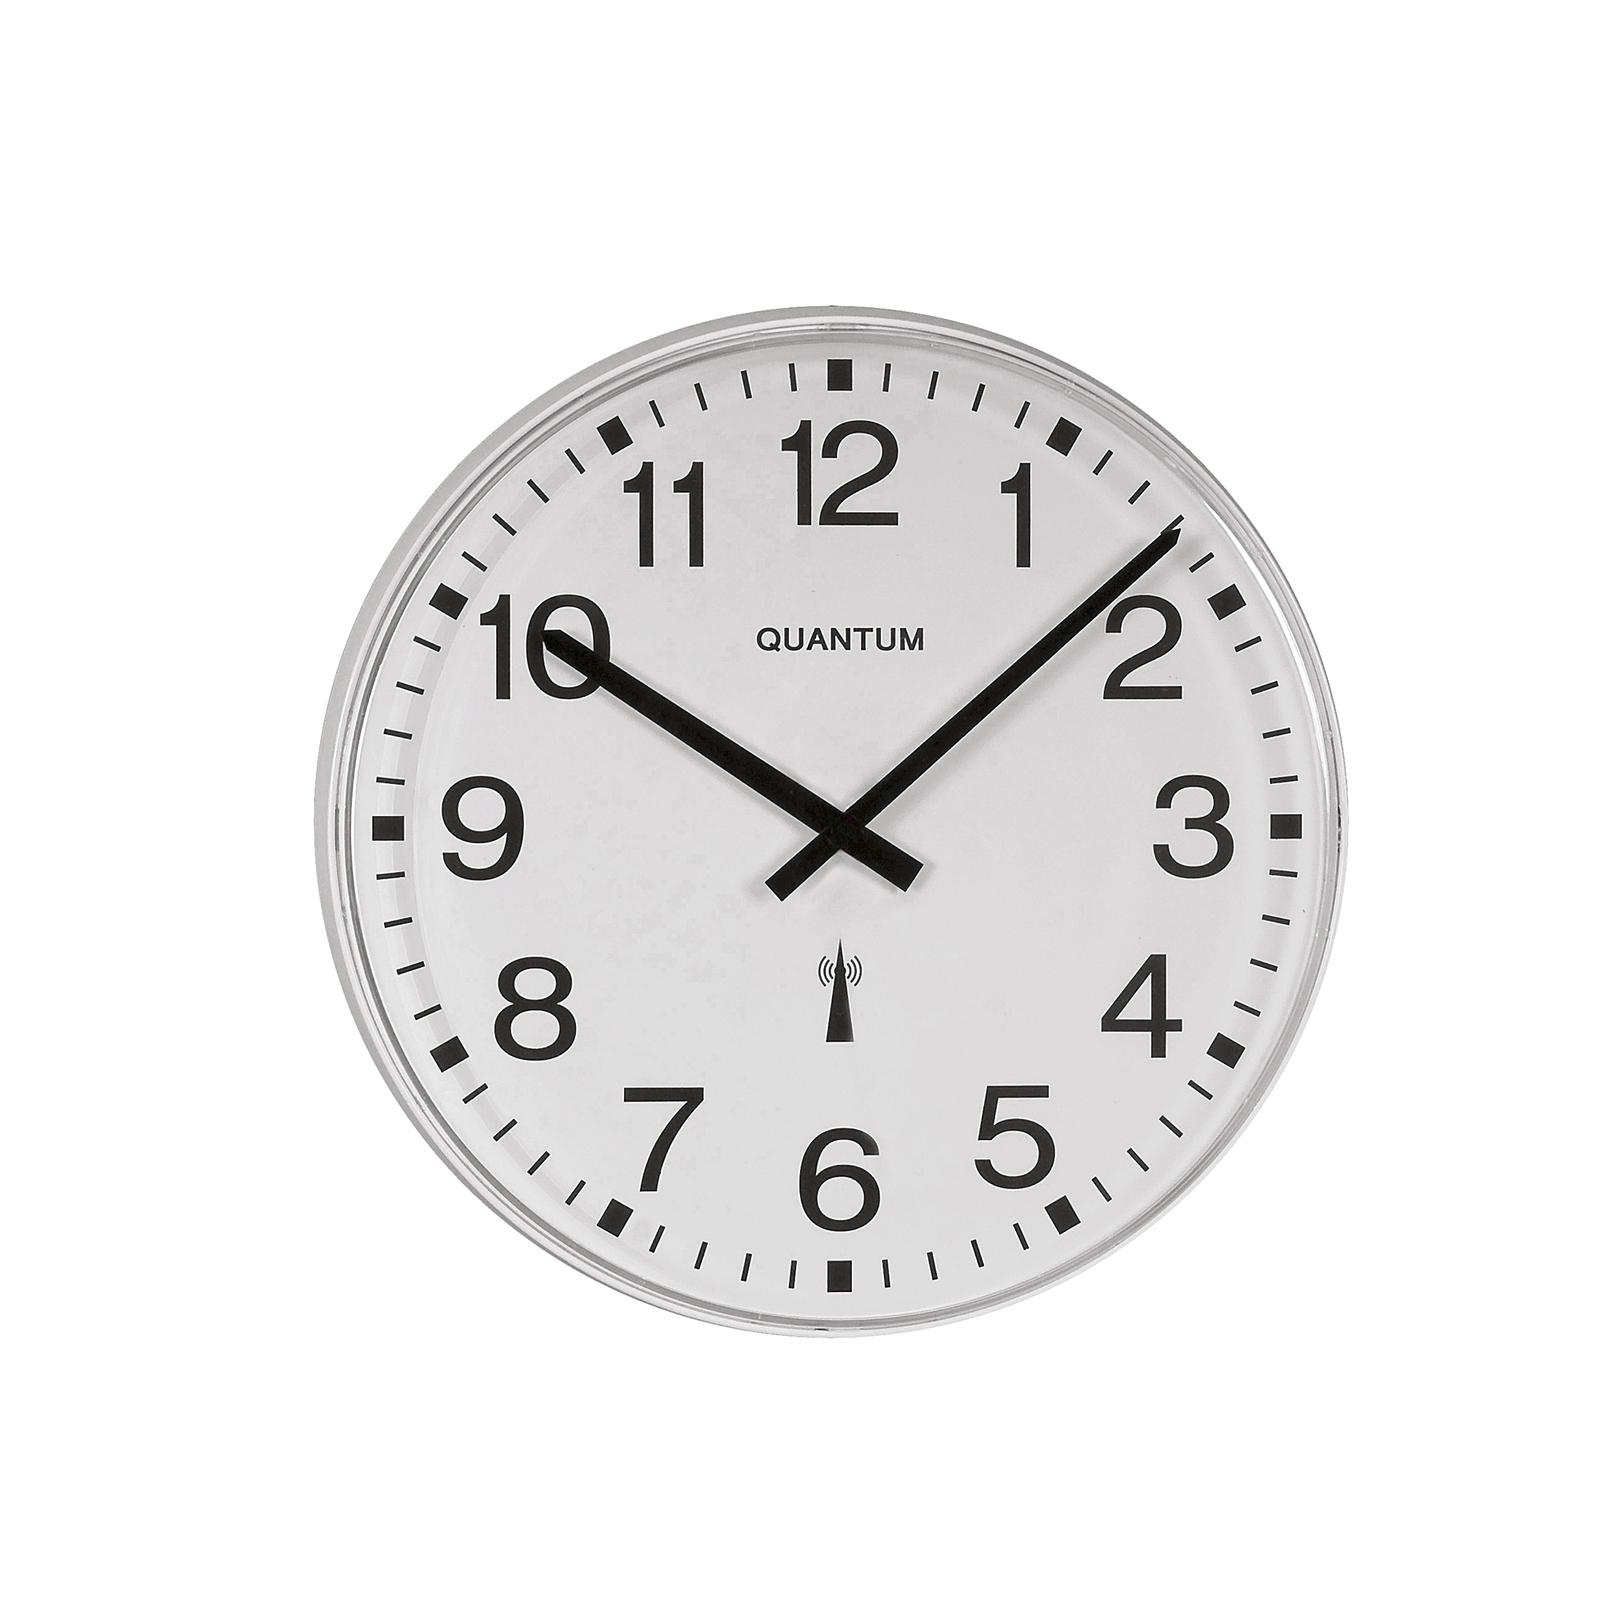 Quantum Wall Clocks - 300mm